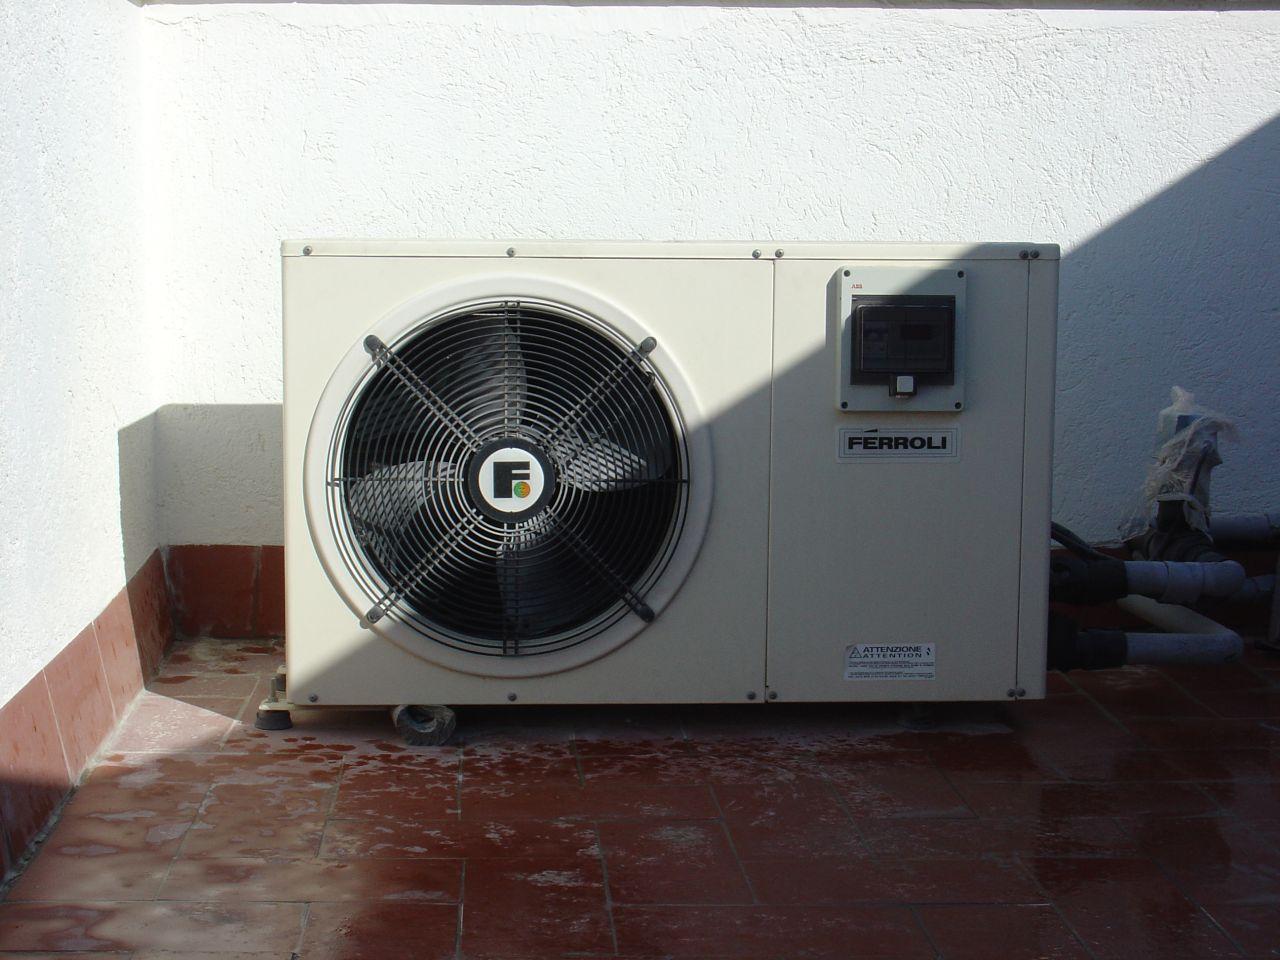 Bomba de calor de fuente de aire un aparato de - Bombas de calor para calefaccion ...